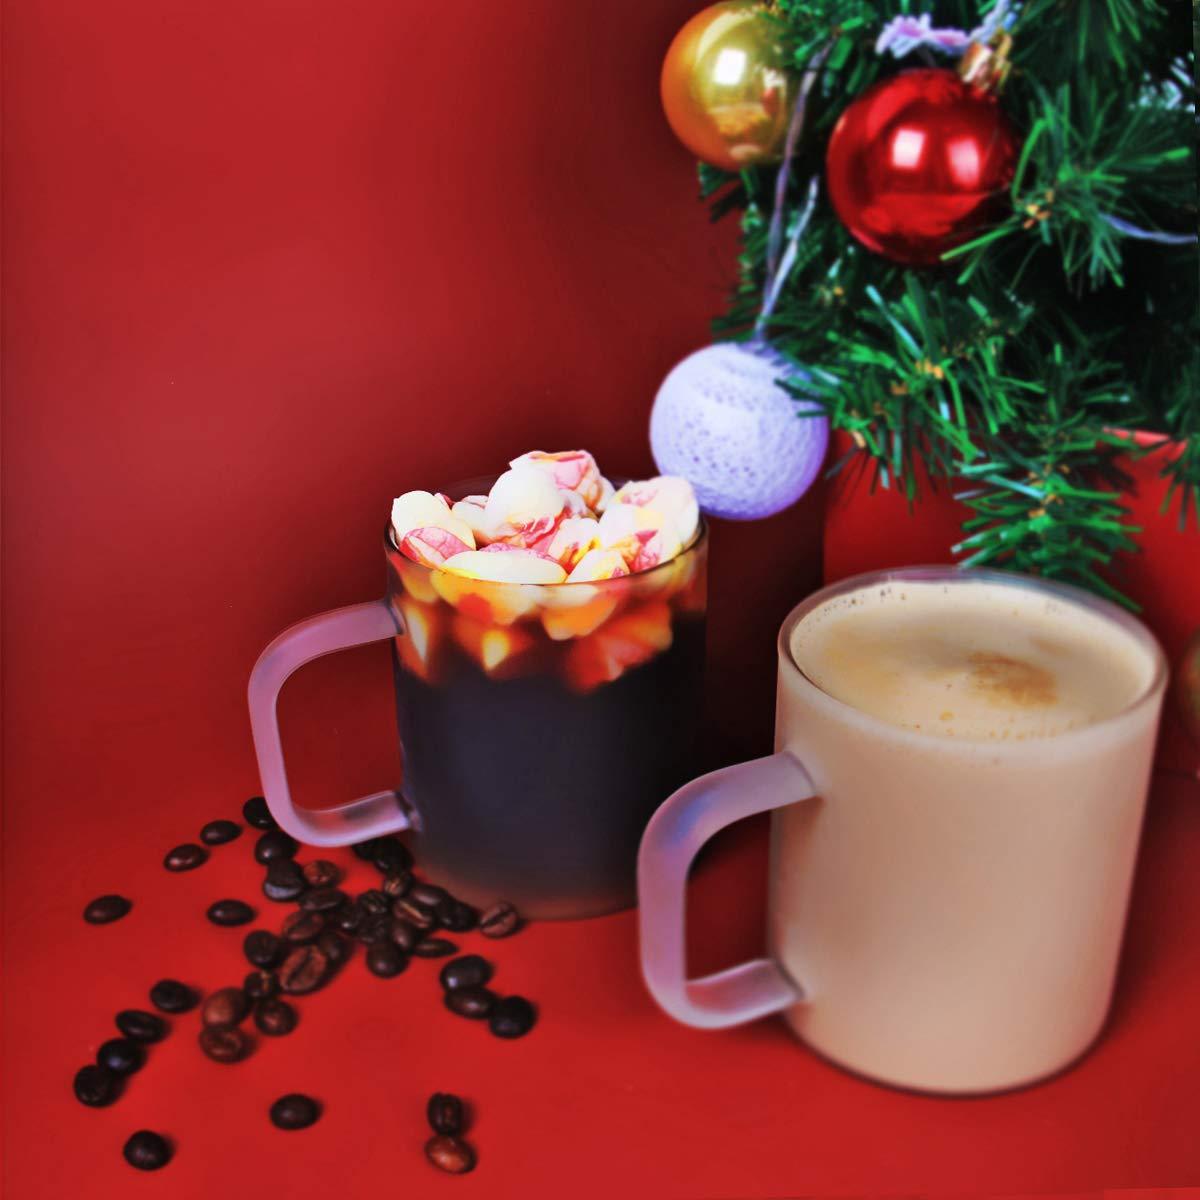 MIOCARO Glass Espresso Mug Coffee Cup Matt Tea Cup With Handle - 12 oz, Set of 2